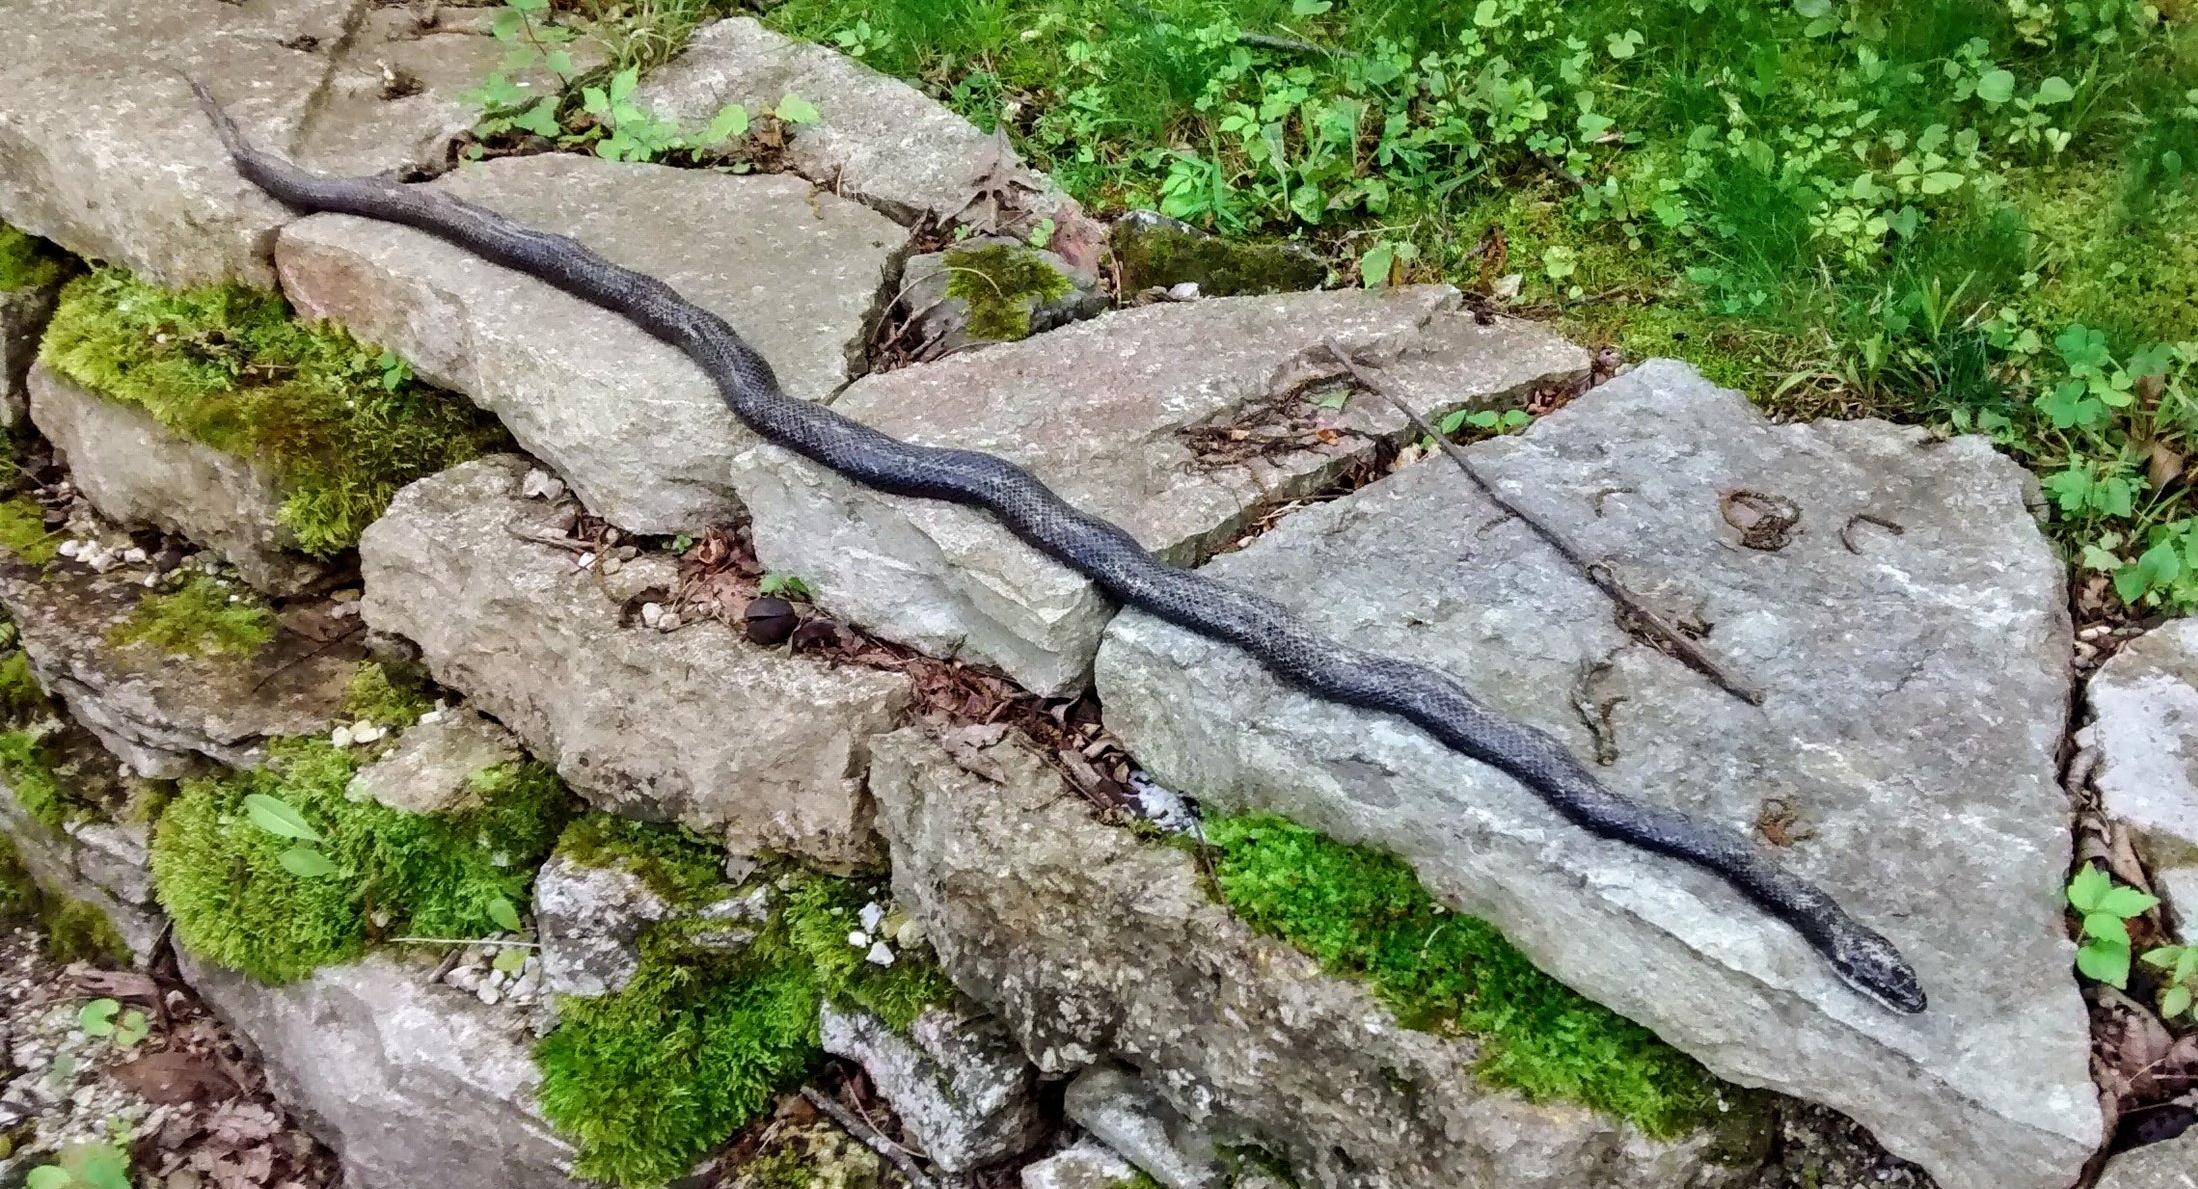 Black snake sunning itself